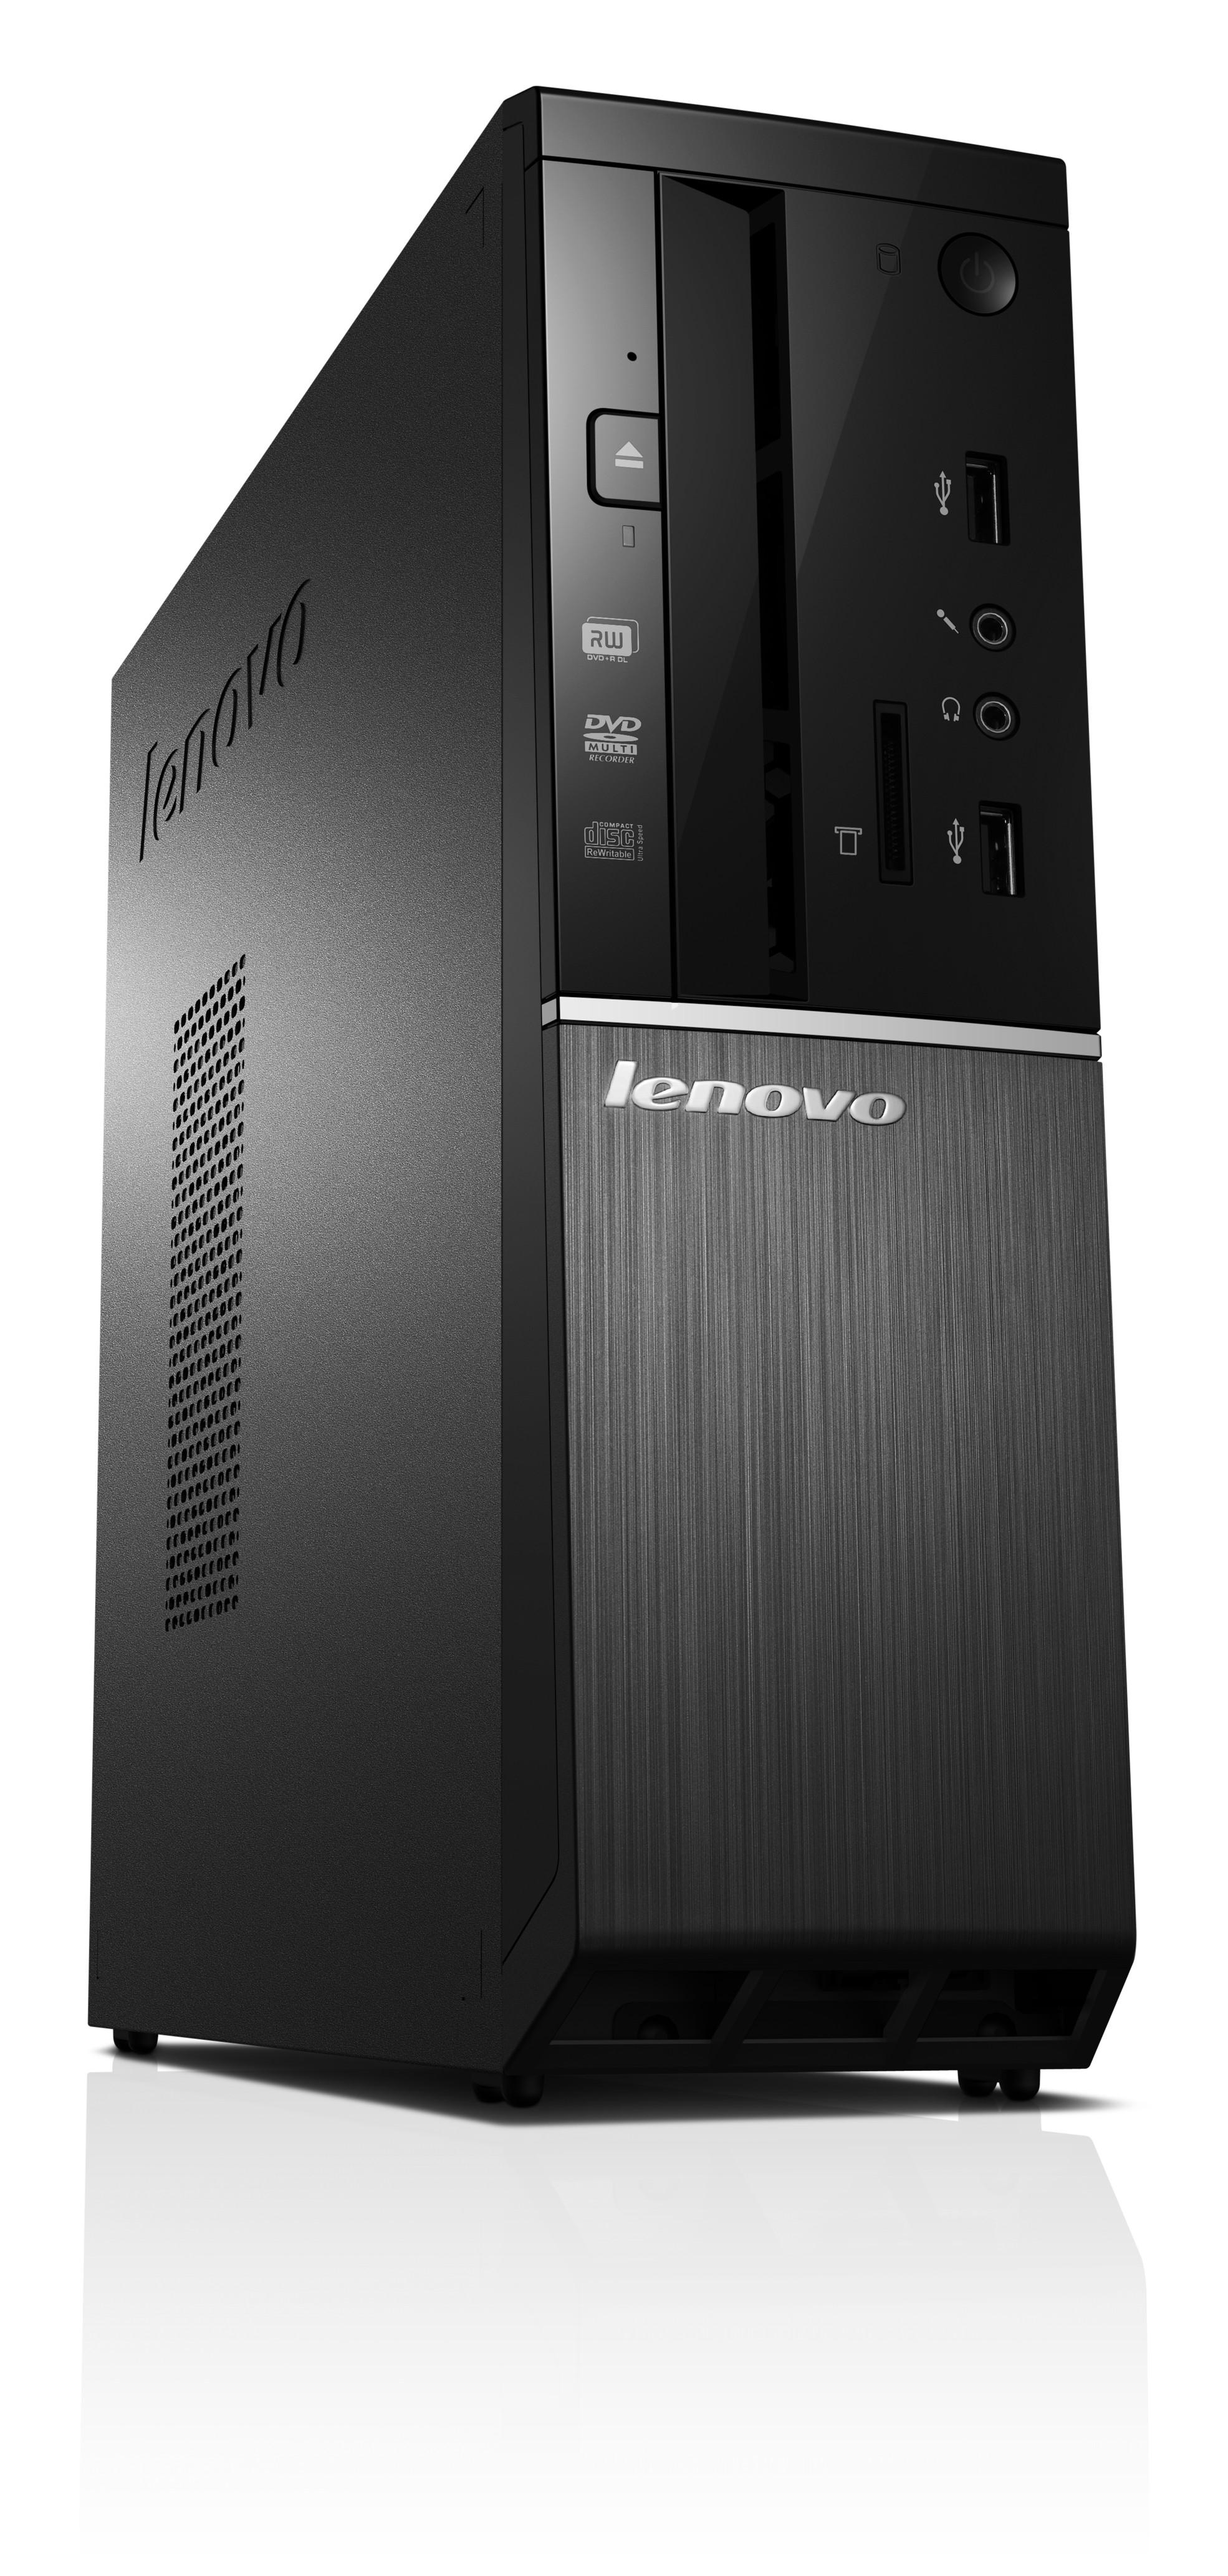 Lenovo IdeaCentre 300s/i3-4070/4G/500/INT/DVD/ WIN10